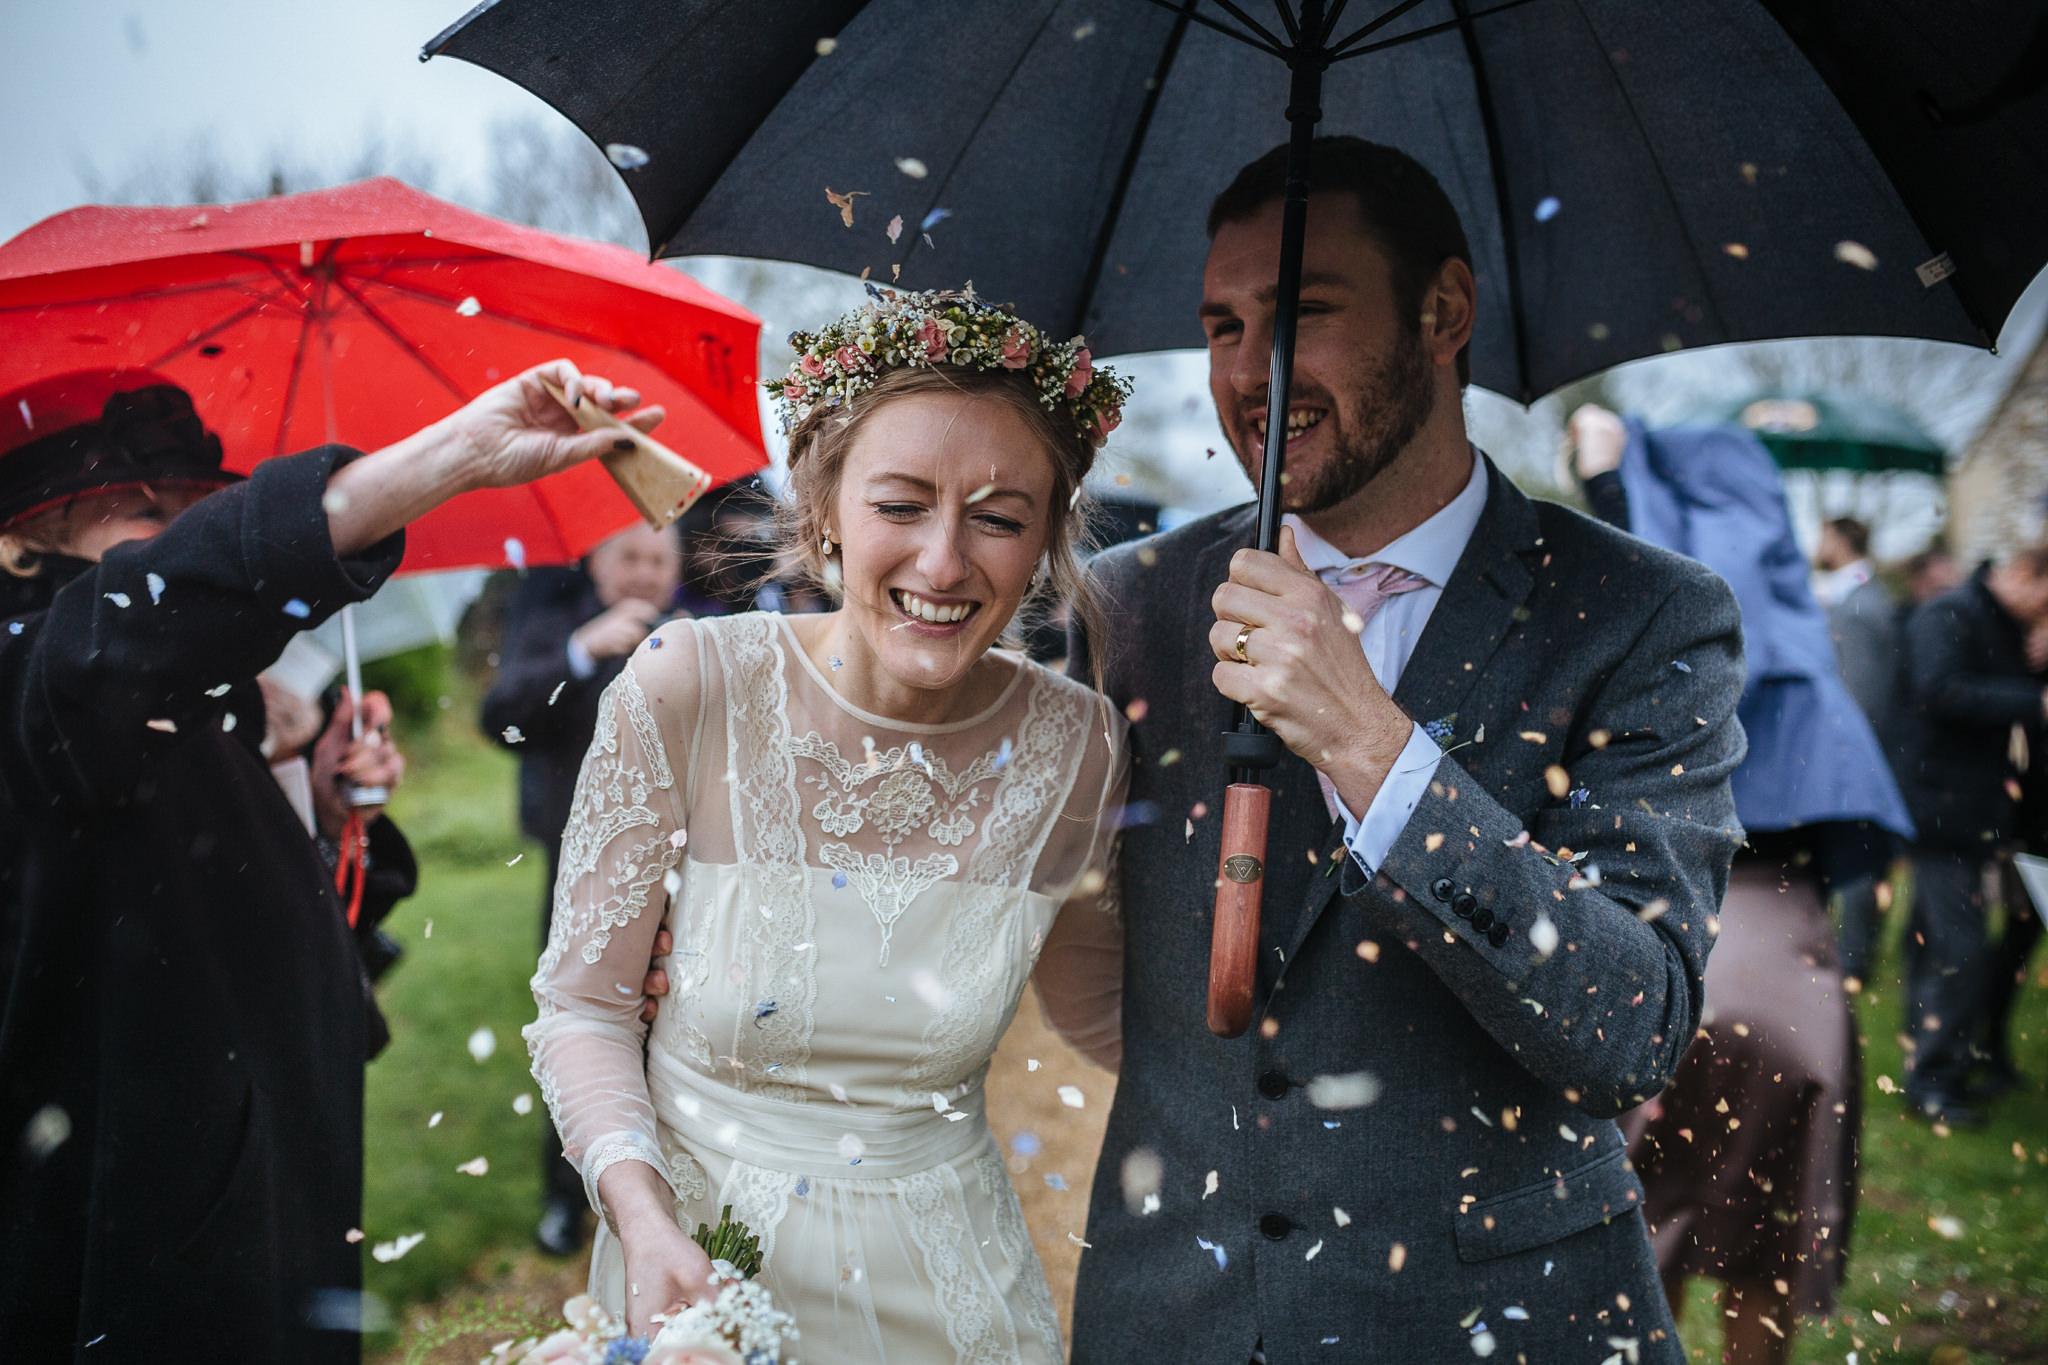 Creative-reportage-wedding-photography-90026